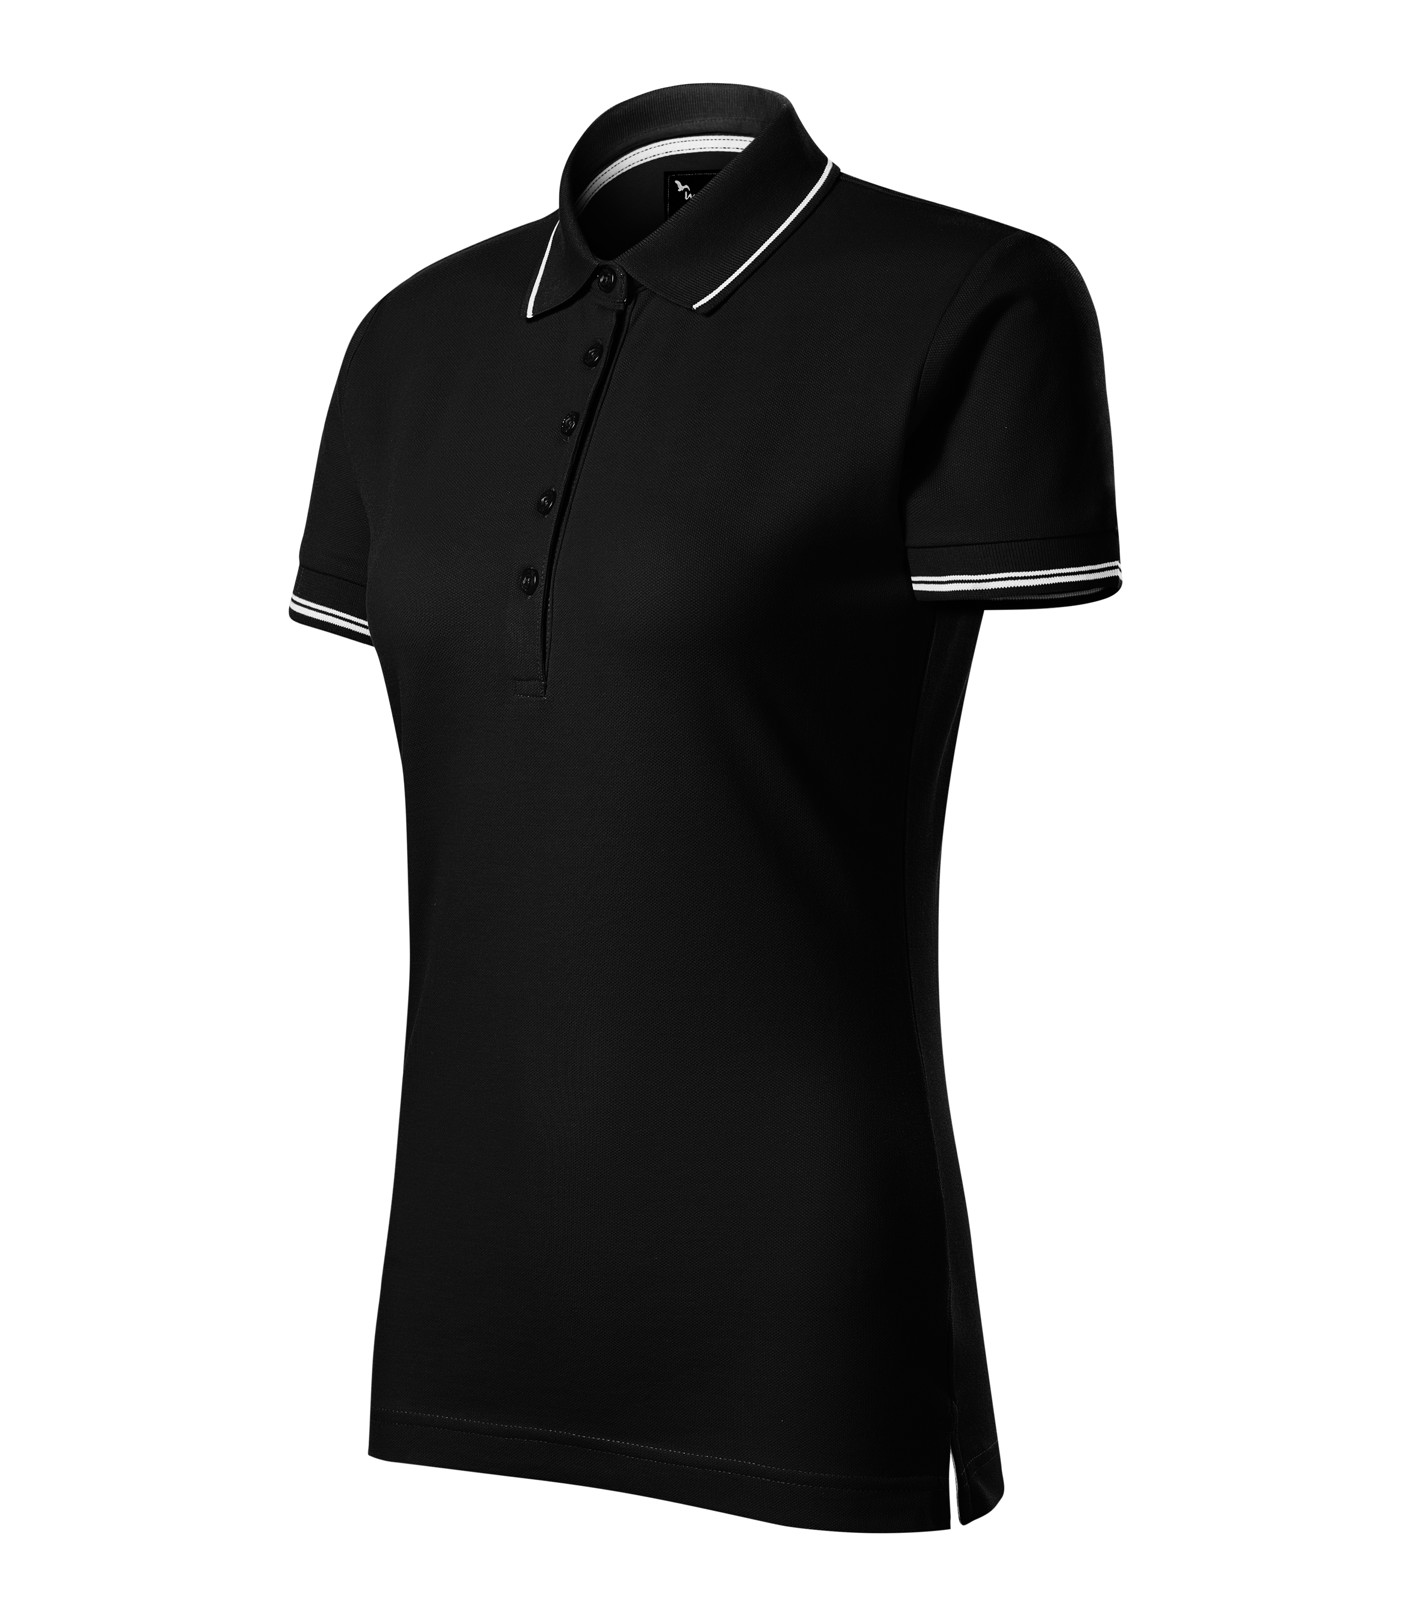 Polo Shirt women's Malfinipremium Perfection plain - Black / M